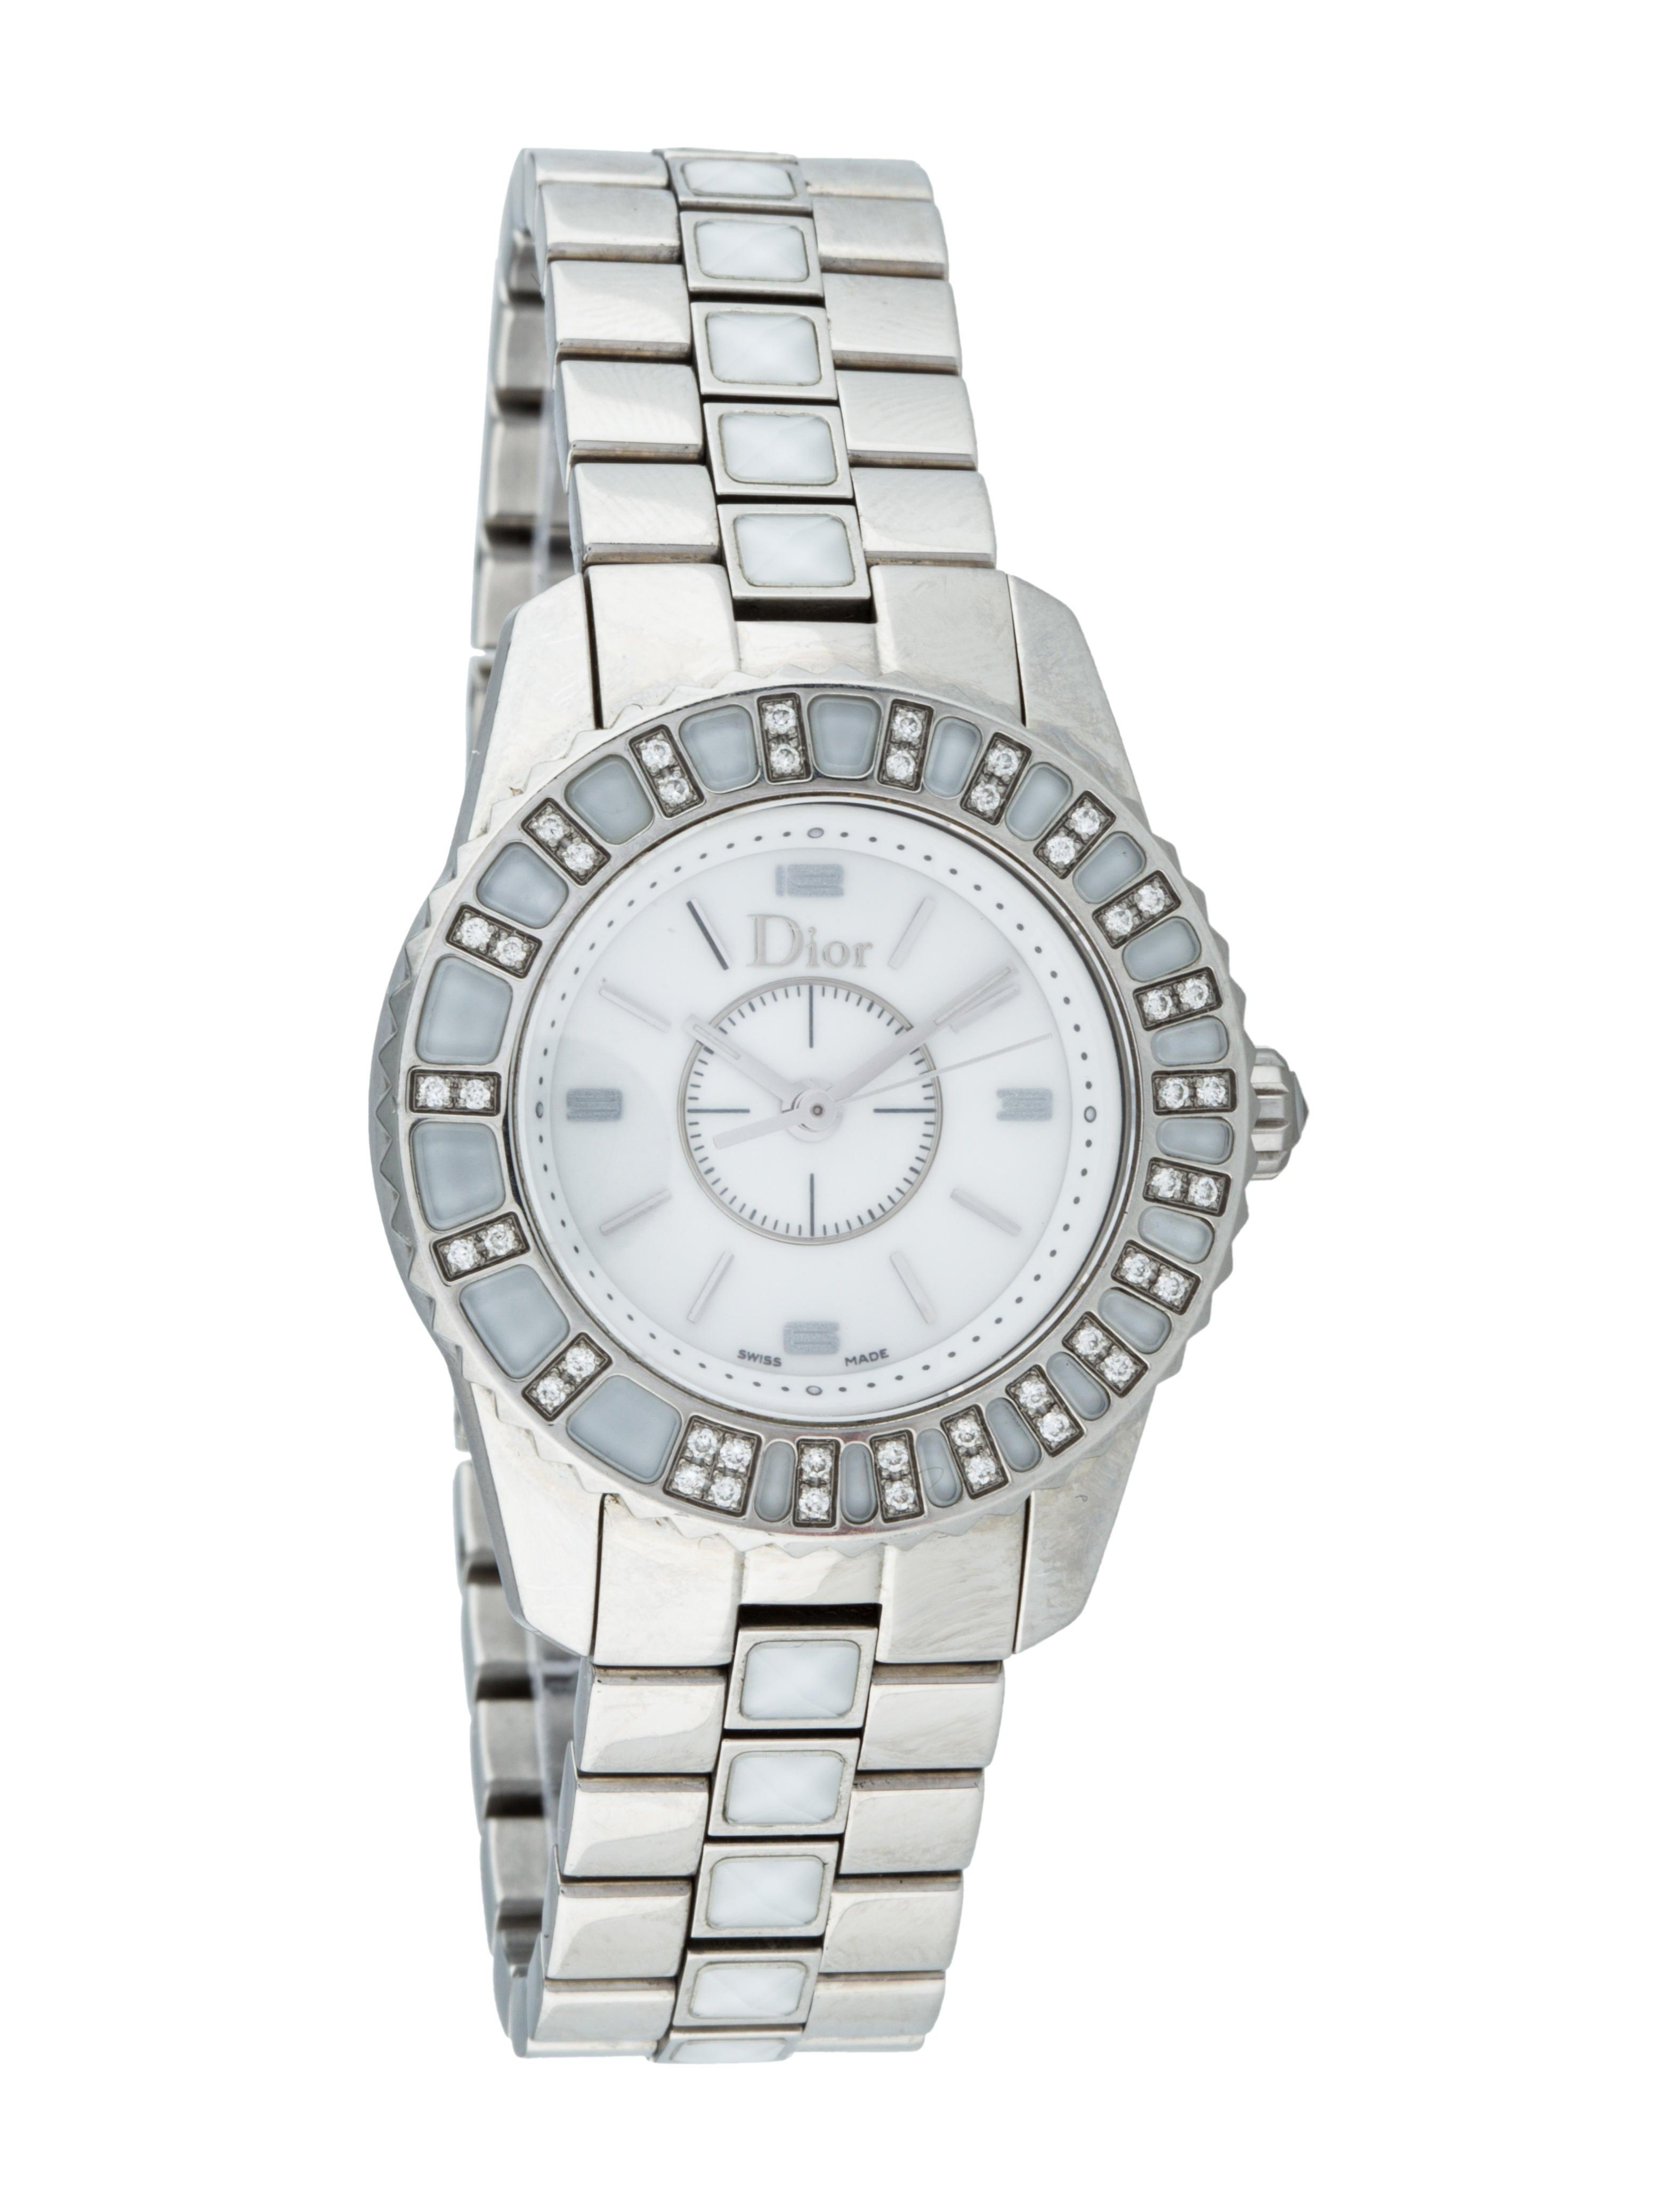 Christian dior christal watch fine watches chr29411 the realreal for Christian dior watches